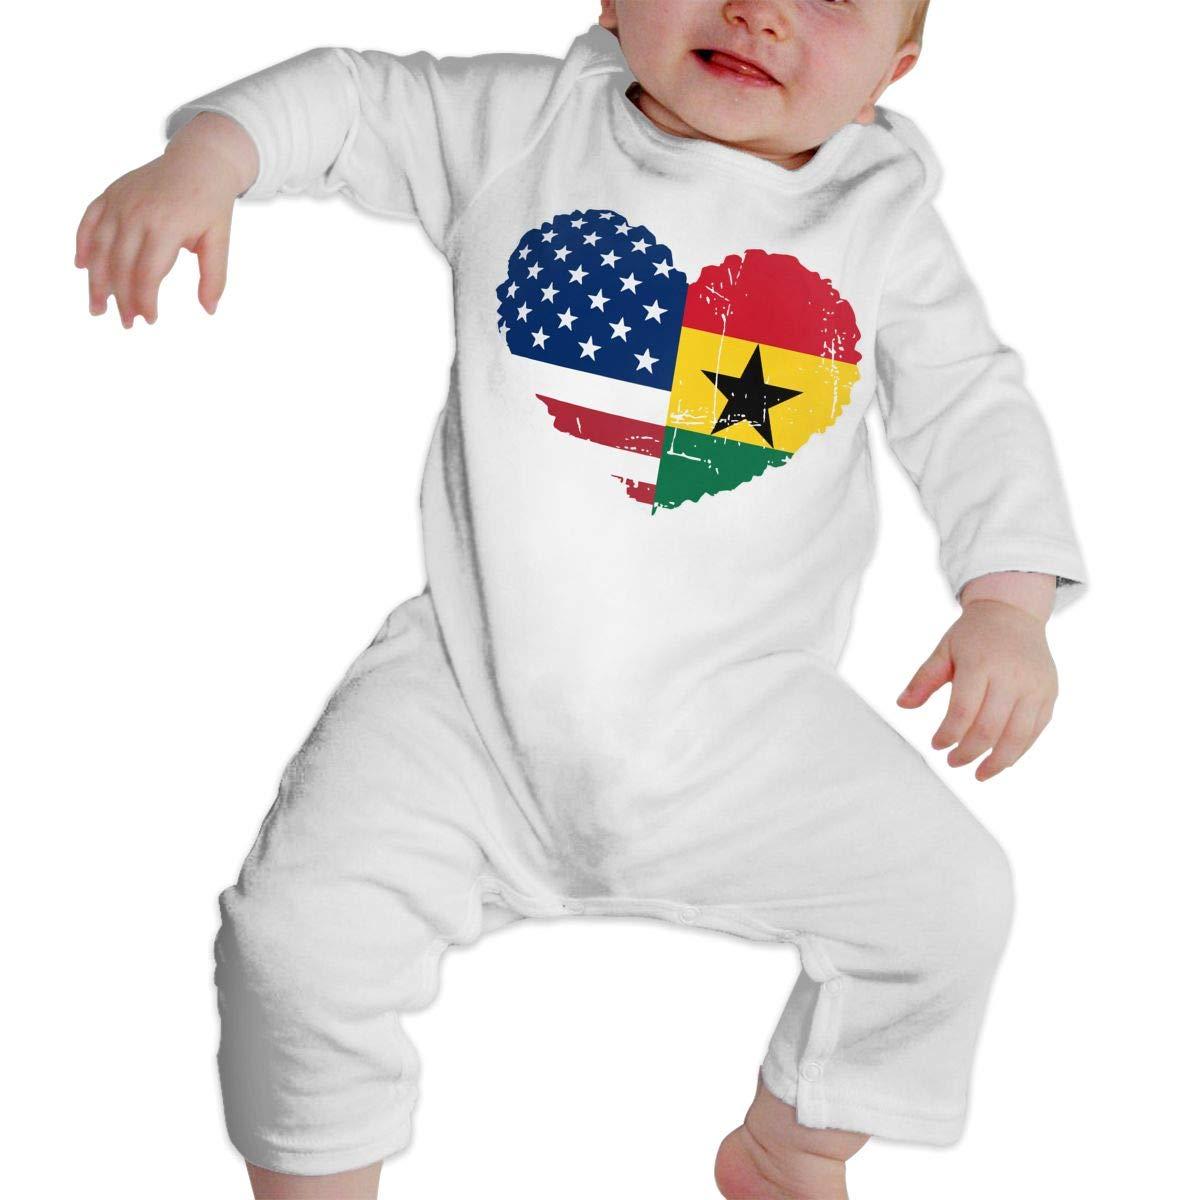 A1BY-5US Newborn Baby Boys Girls Cotton Long Sleeve Ghana USA Flag Heart Climb Romper One-Piece Romper Clothes